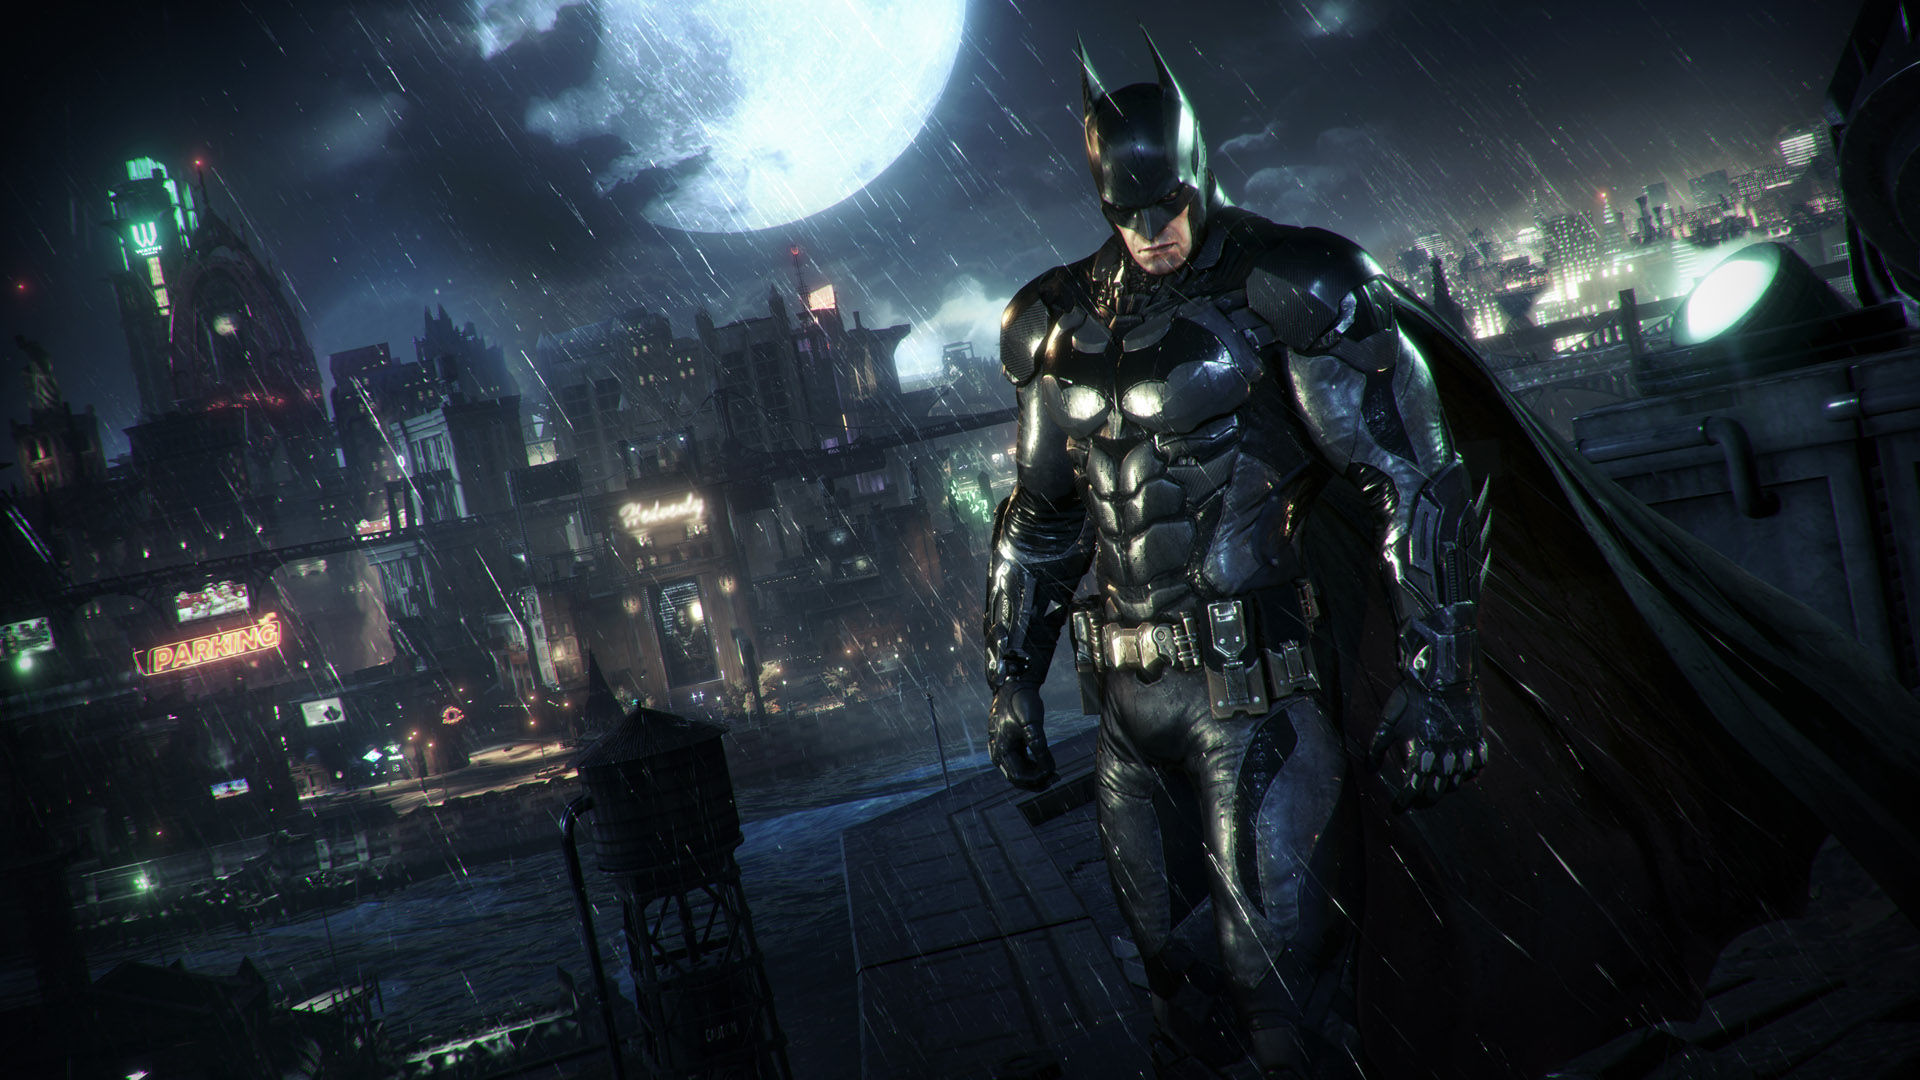 batman_arkham_knight_new_screenshot3_pre_order_bonuses_rocksteady_batmobile1.jpg1